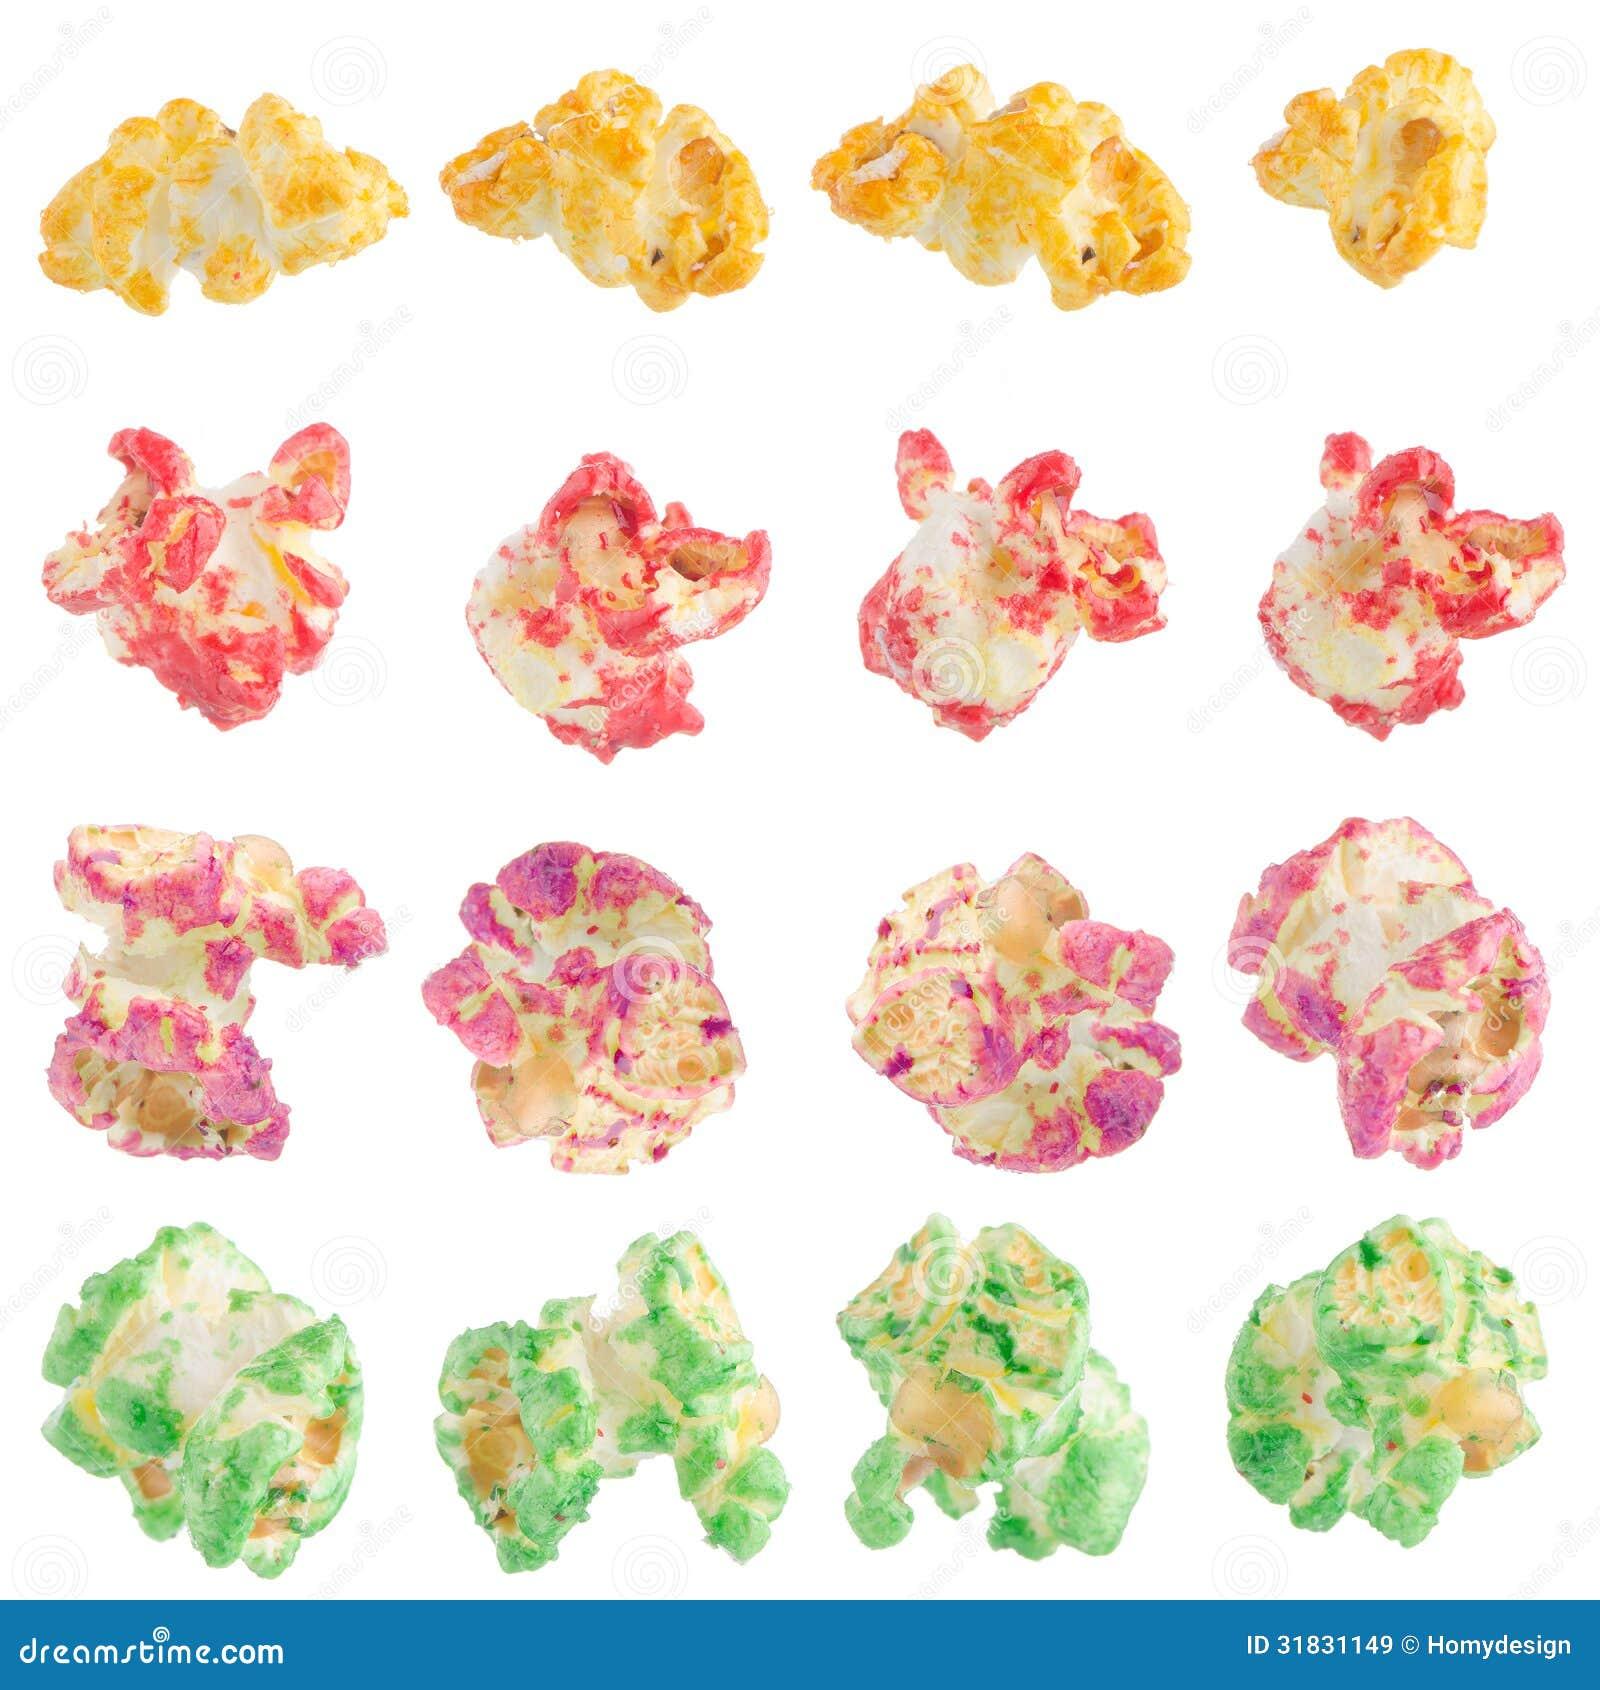 popped color kernels of pop corn - Pop Corn Color